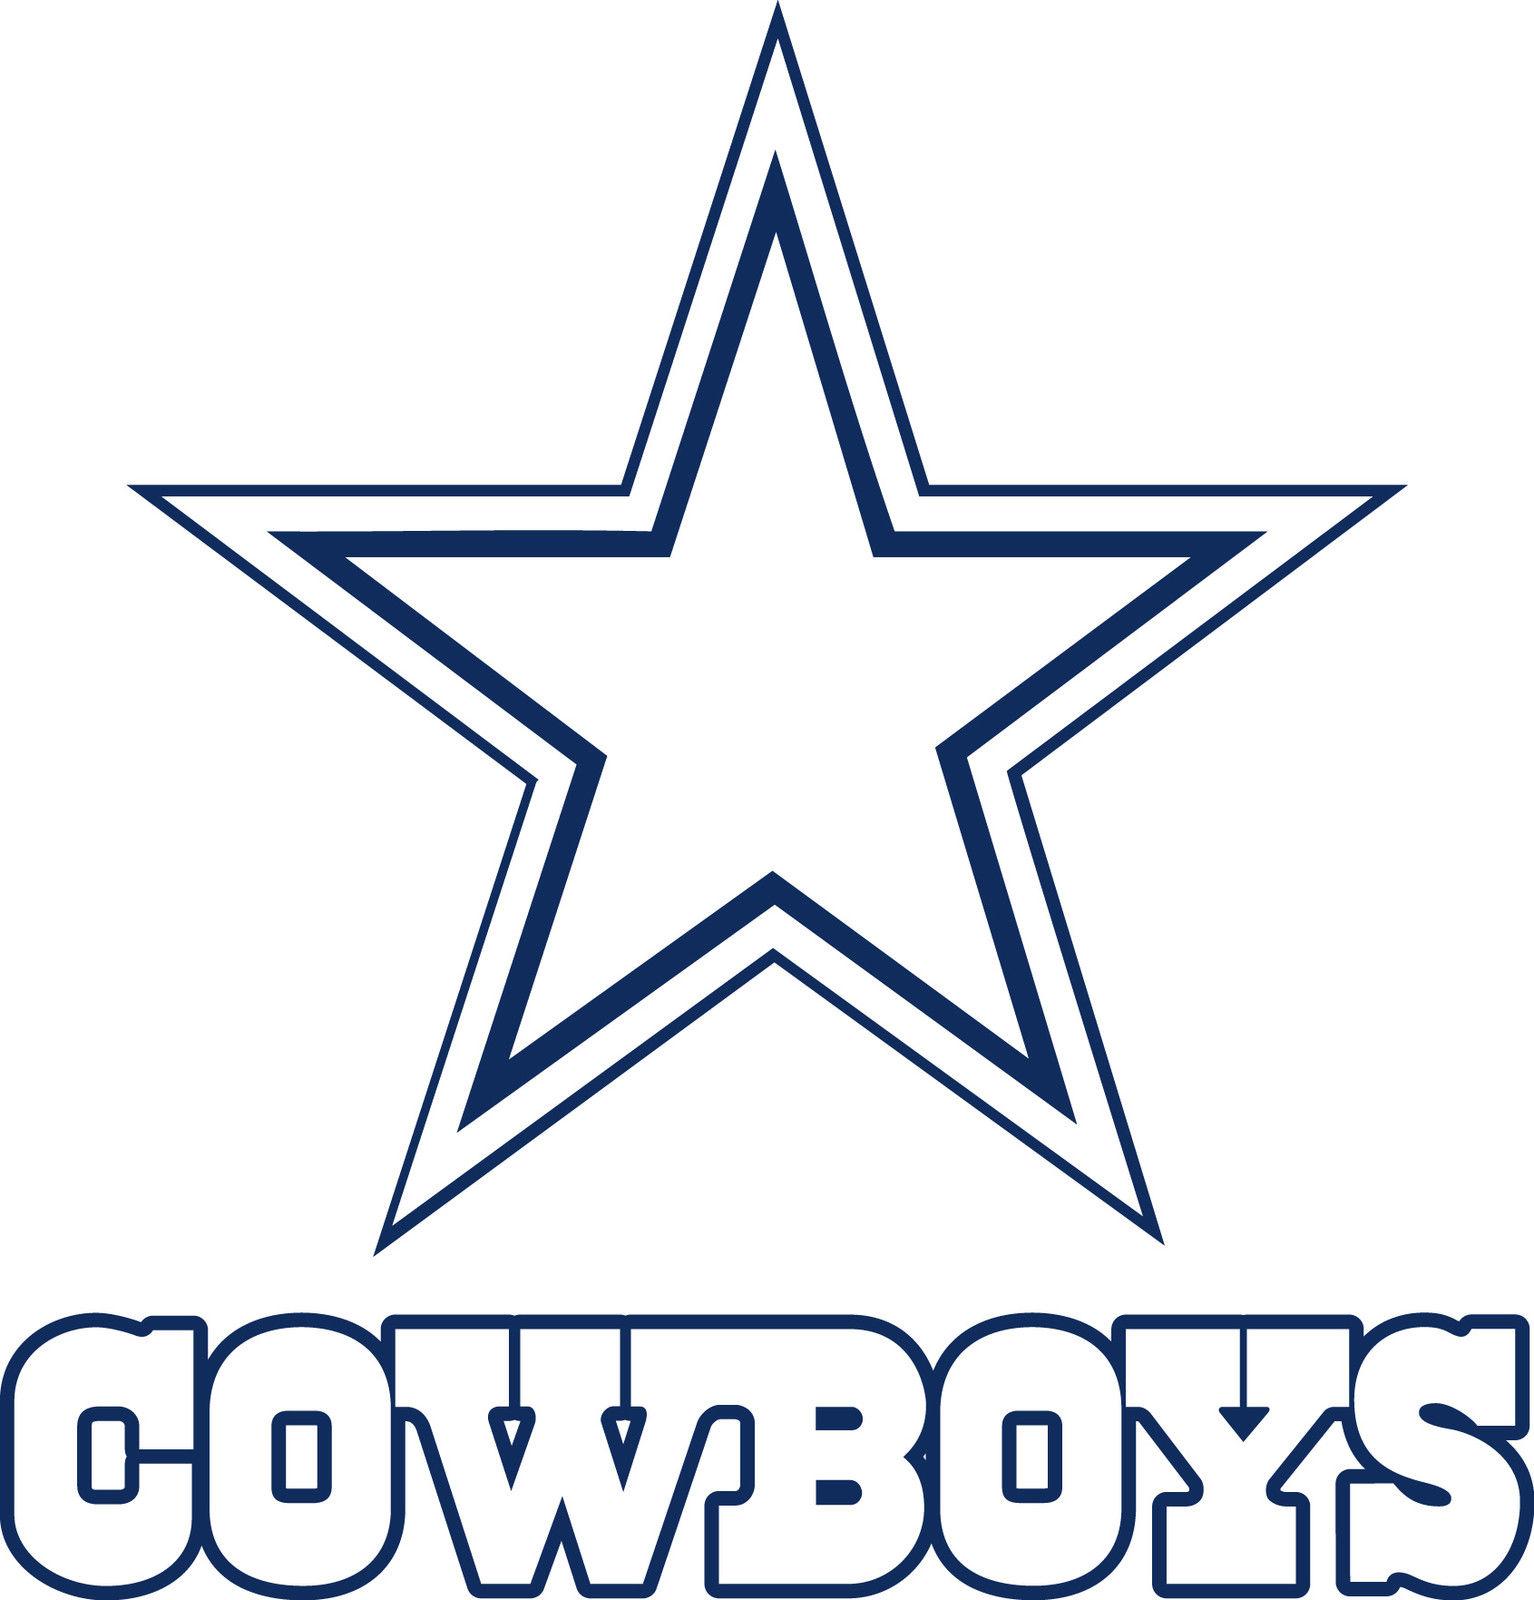 Dallas cowboys emblem clipart png freeuse library 88+ Dallas Cowboys Logo Clip Art   ClipartLook png freeuse library